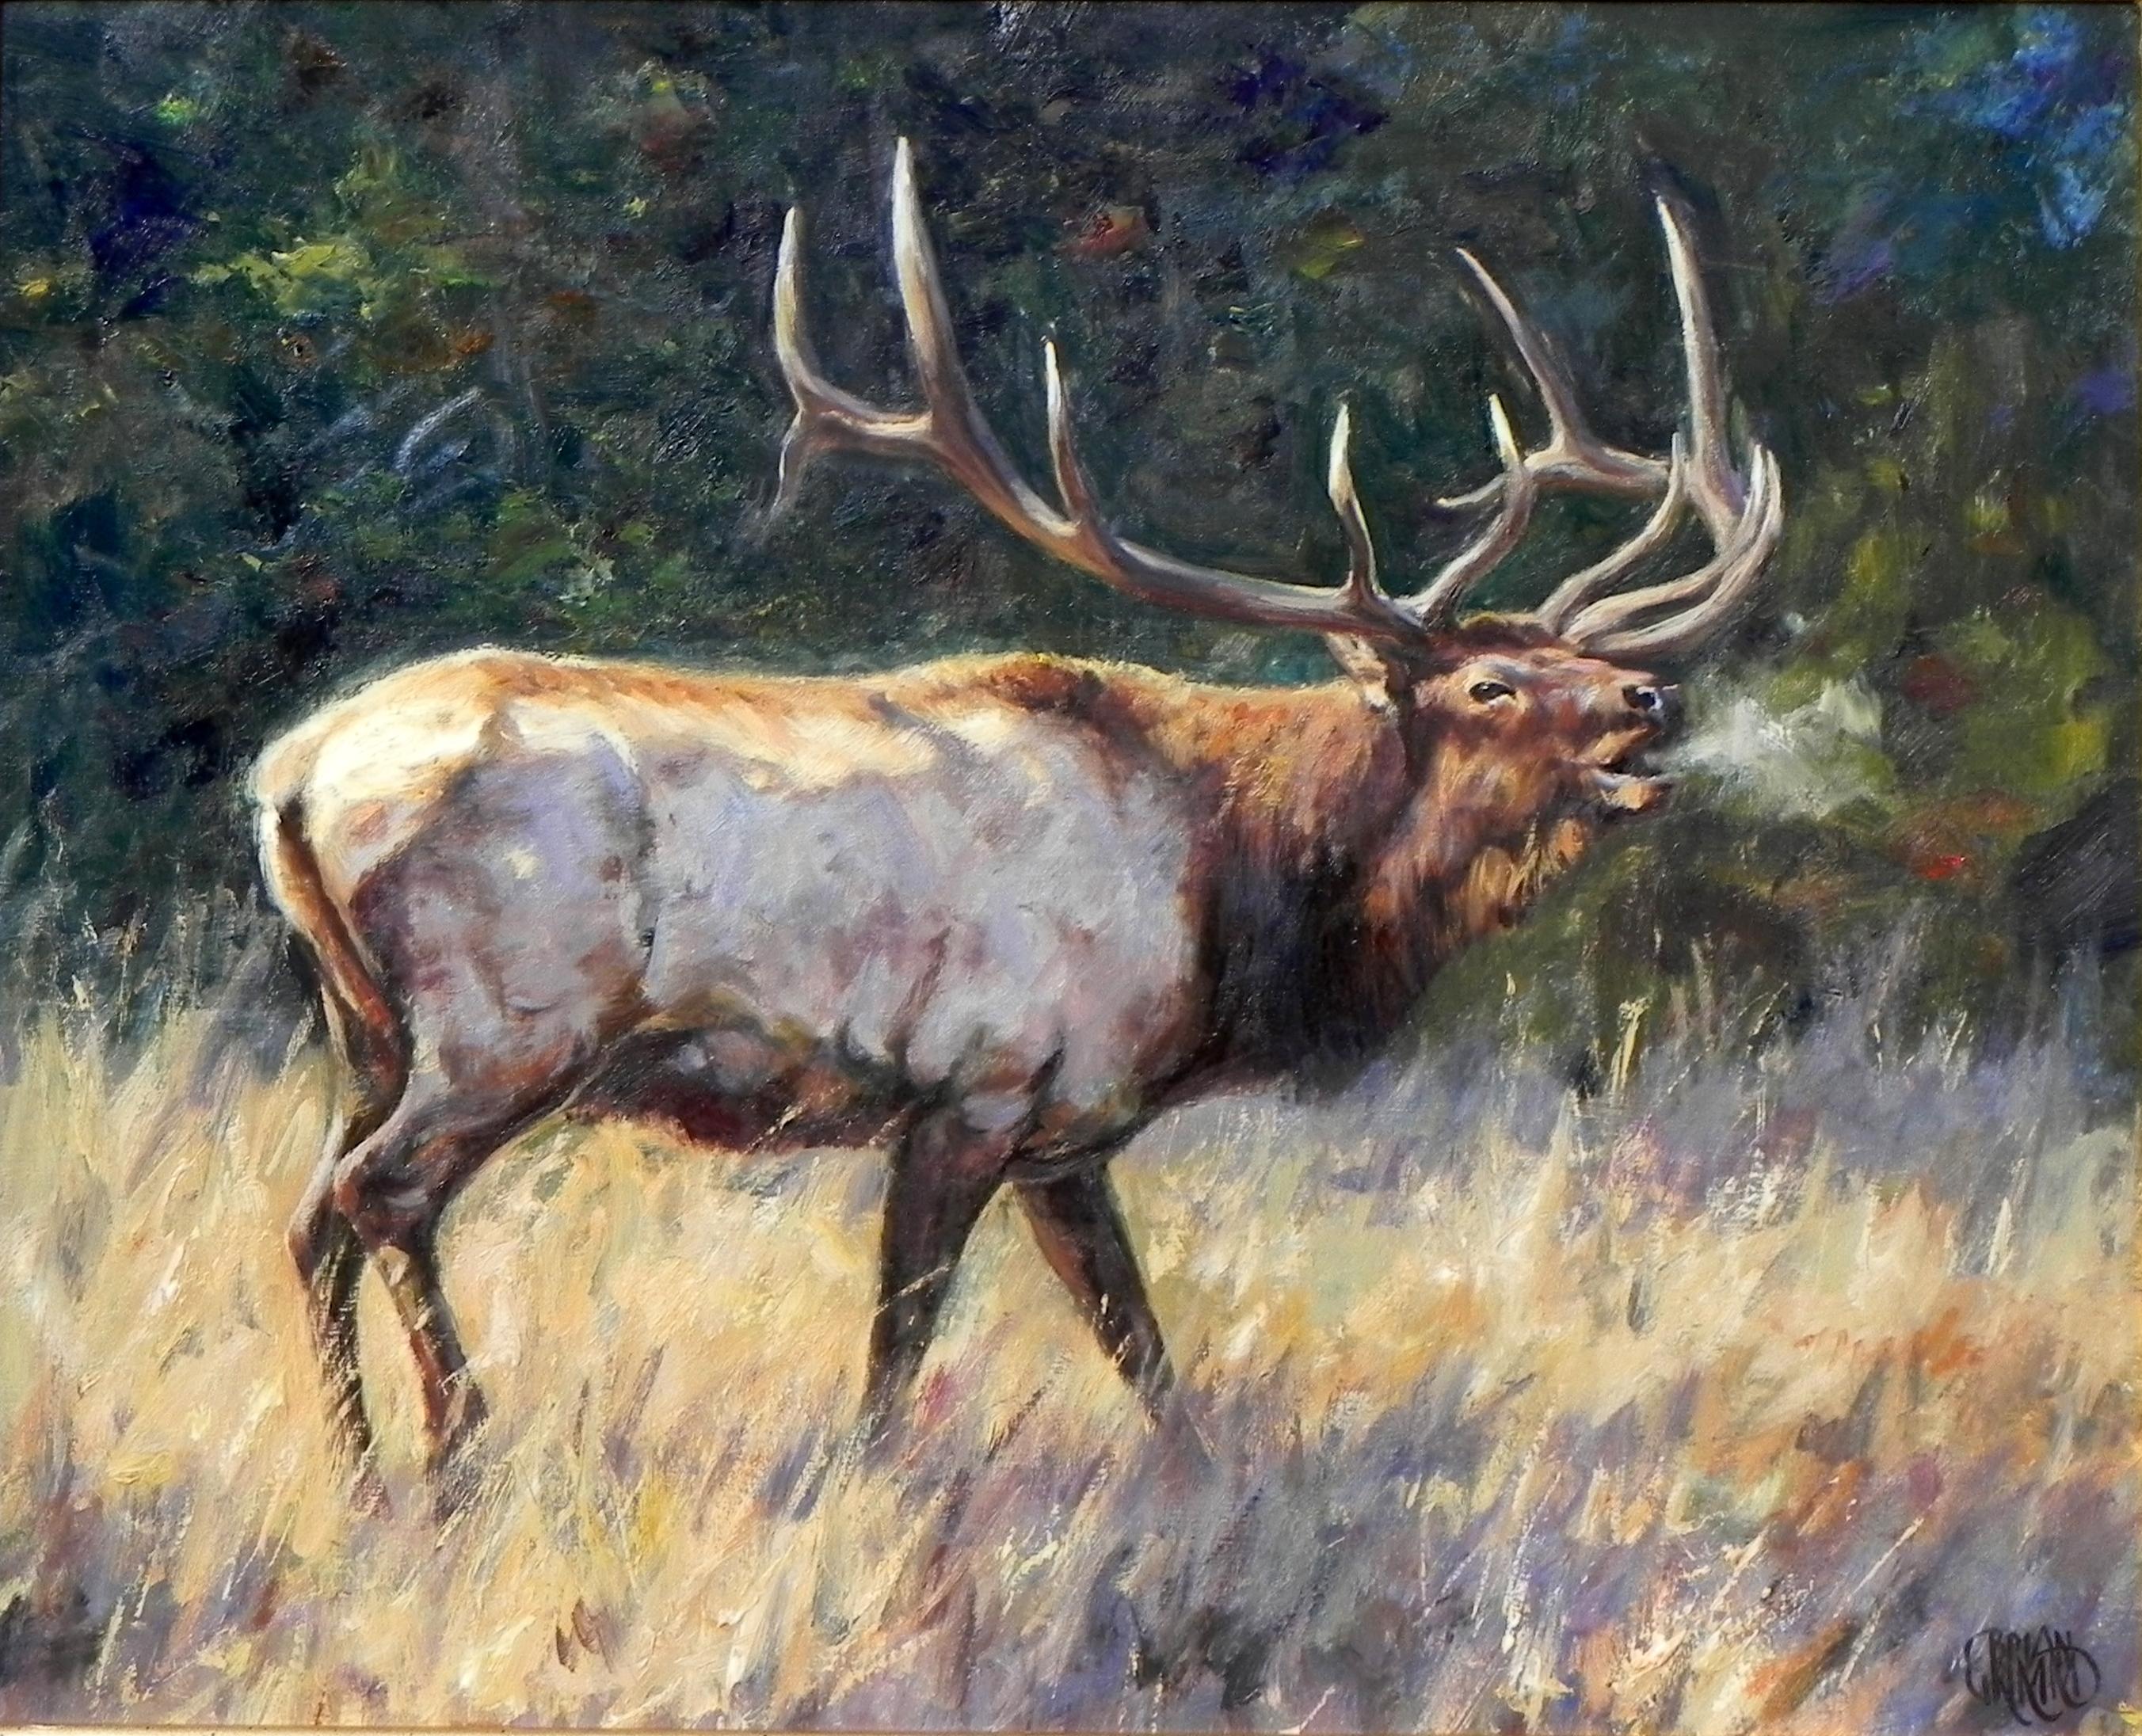 """September Calls"", Brian Grimm, Oil/Canvas, 20x24 in, Moose, Western Landscape"